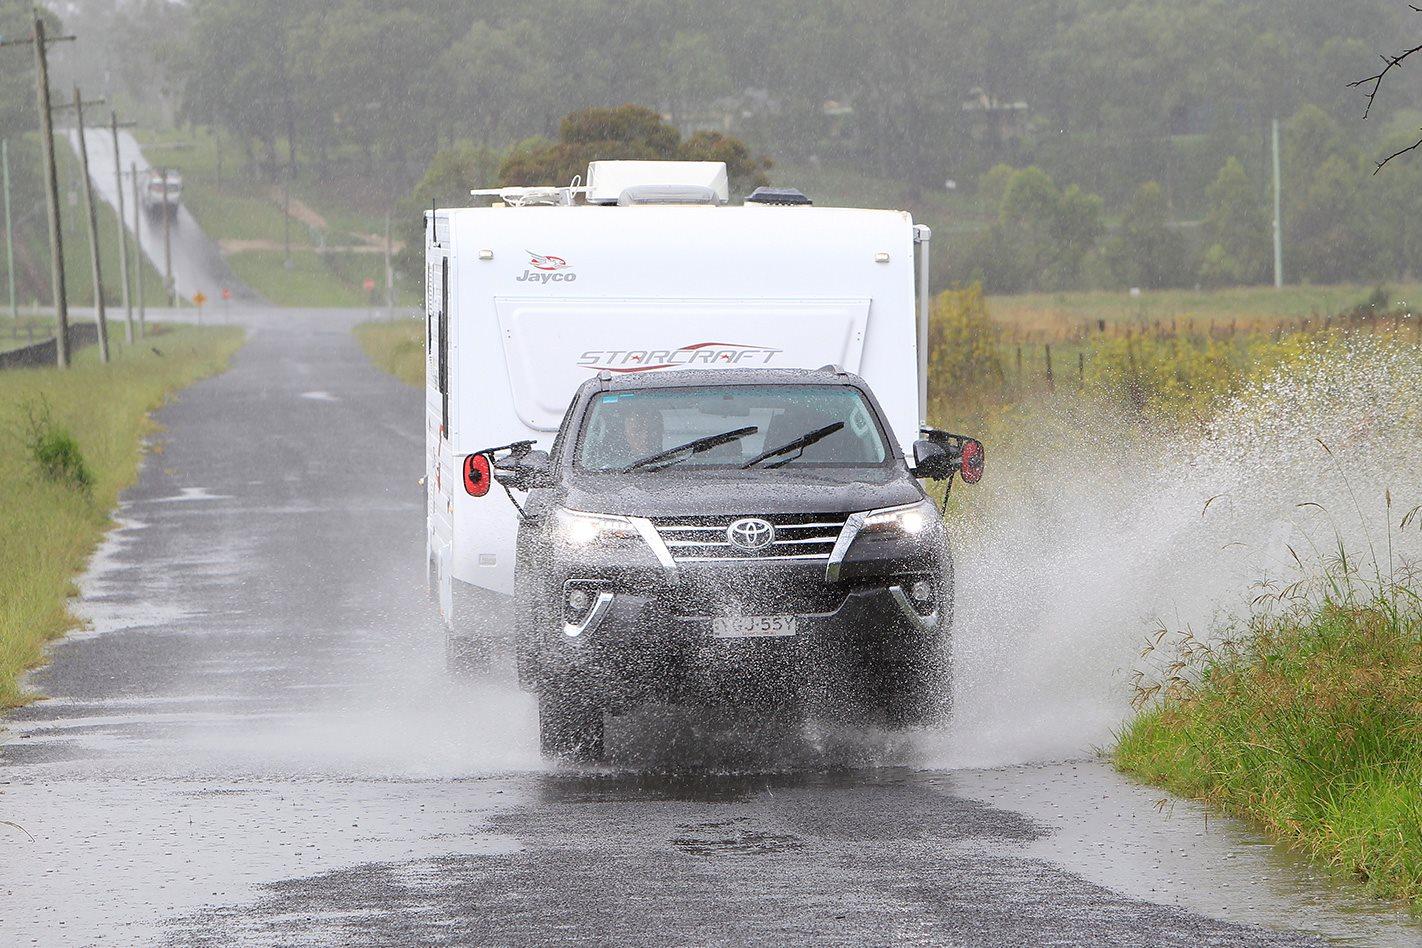 2017 Toyota Fortuner Crusade driving through rain